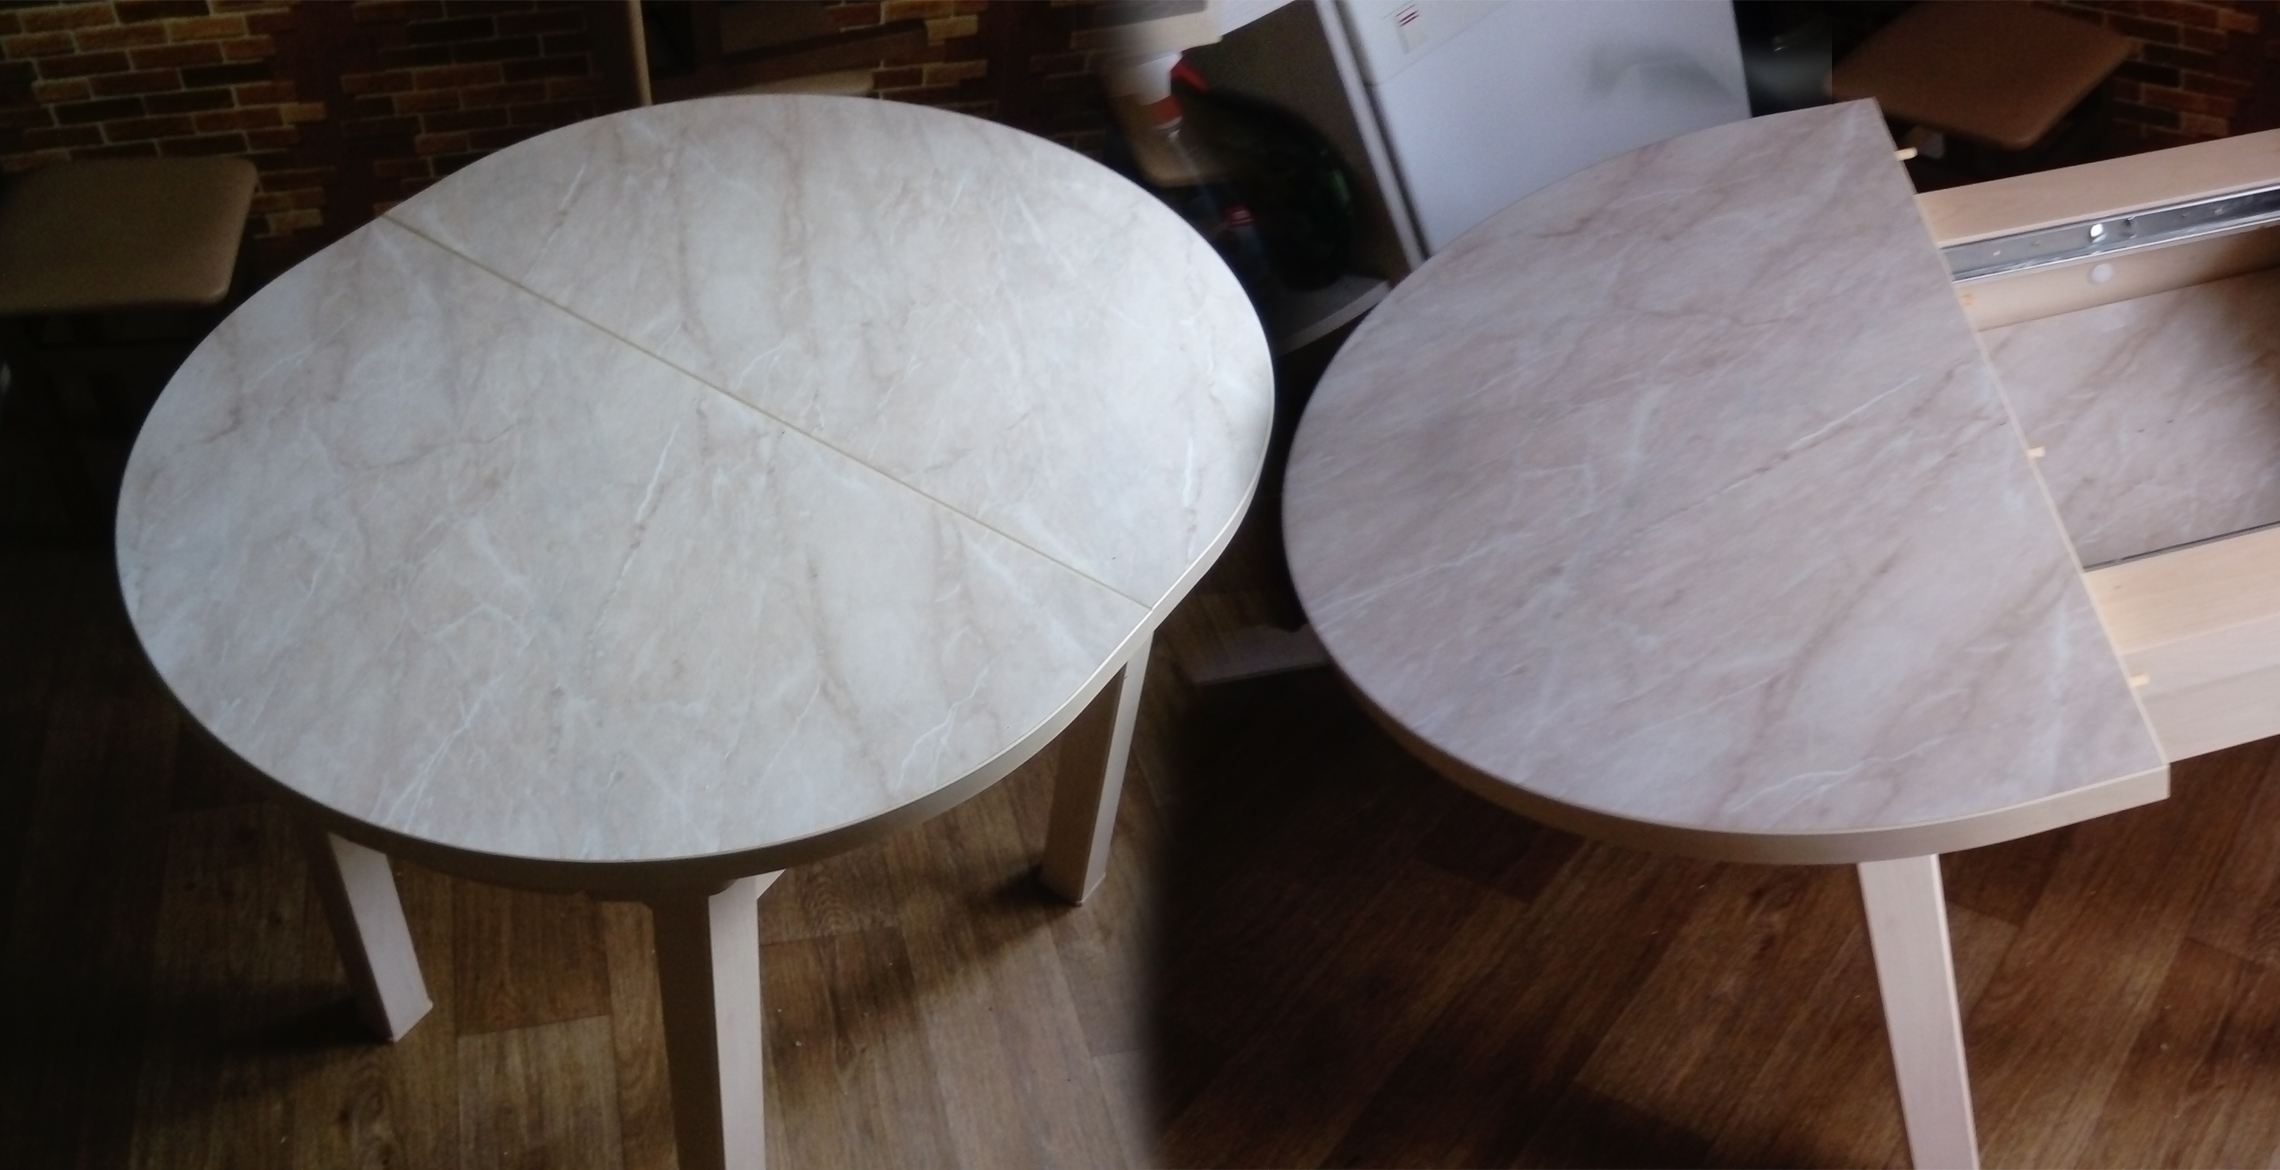 Фото Сборка фабричного кухонного, раздвижного стола.  Время затрачено: ≈1,5 часа.